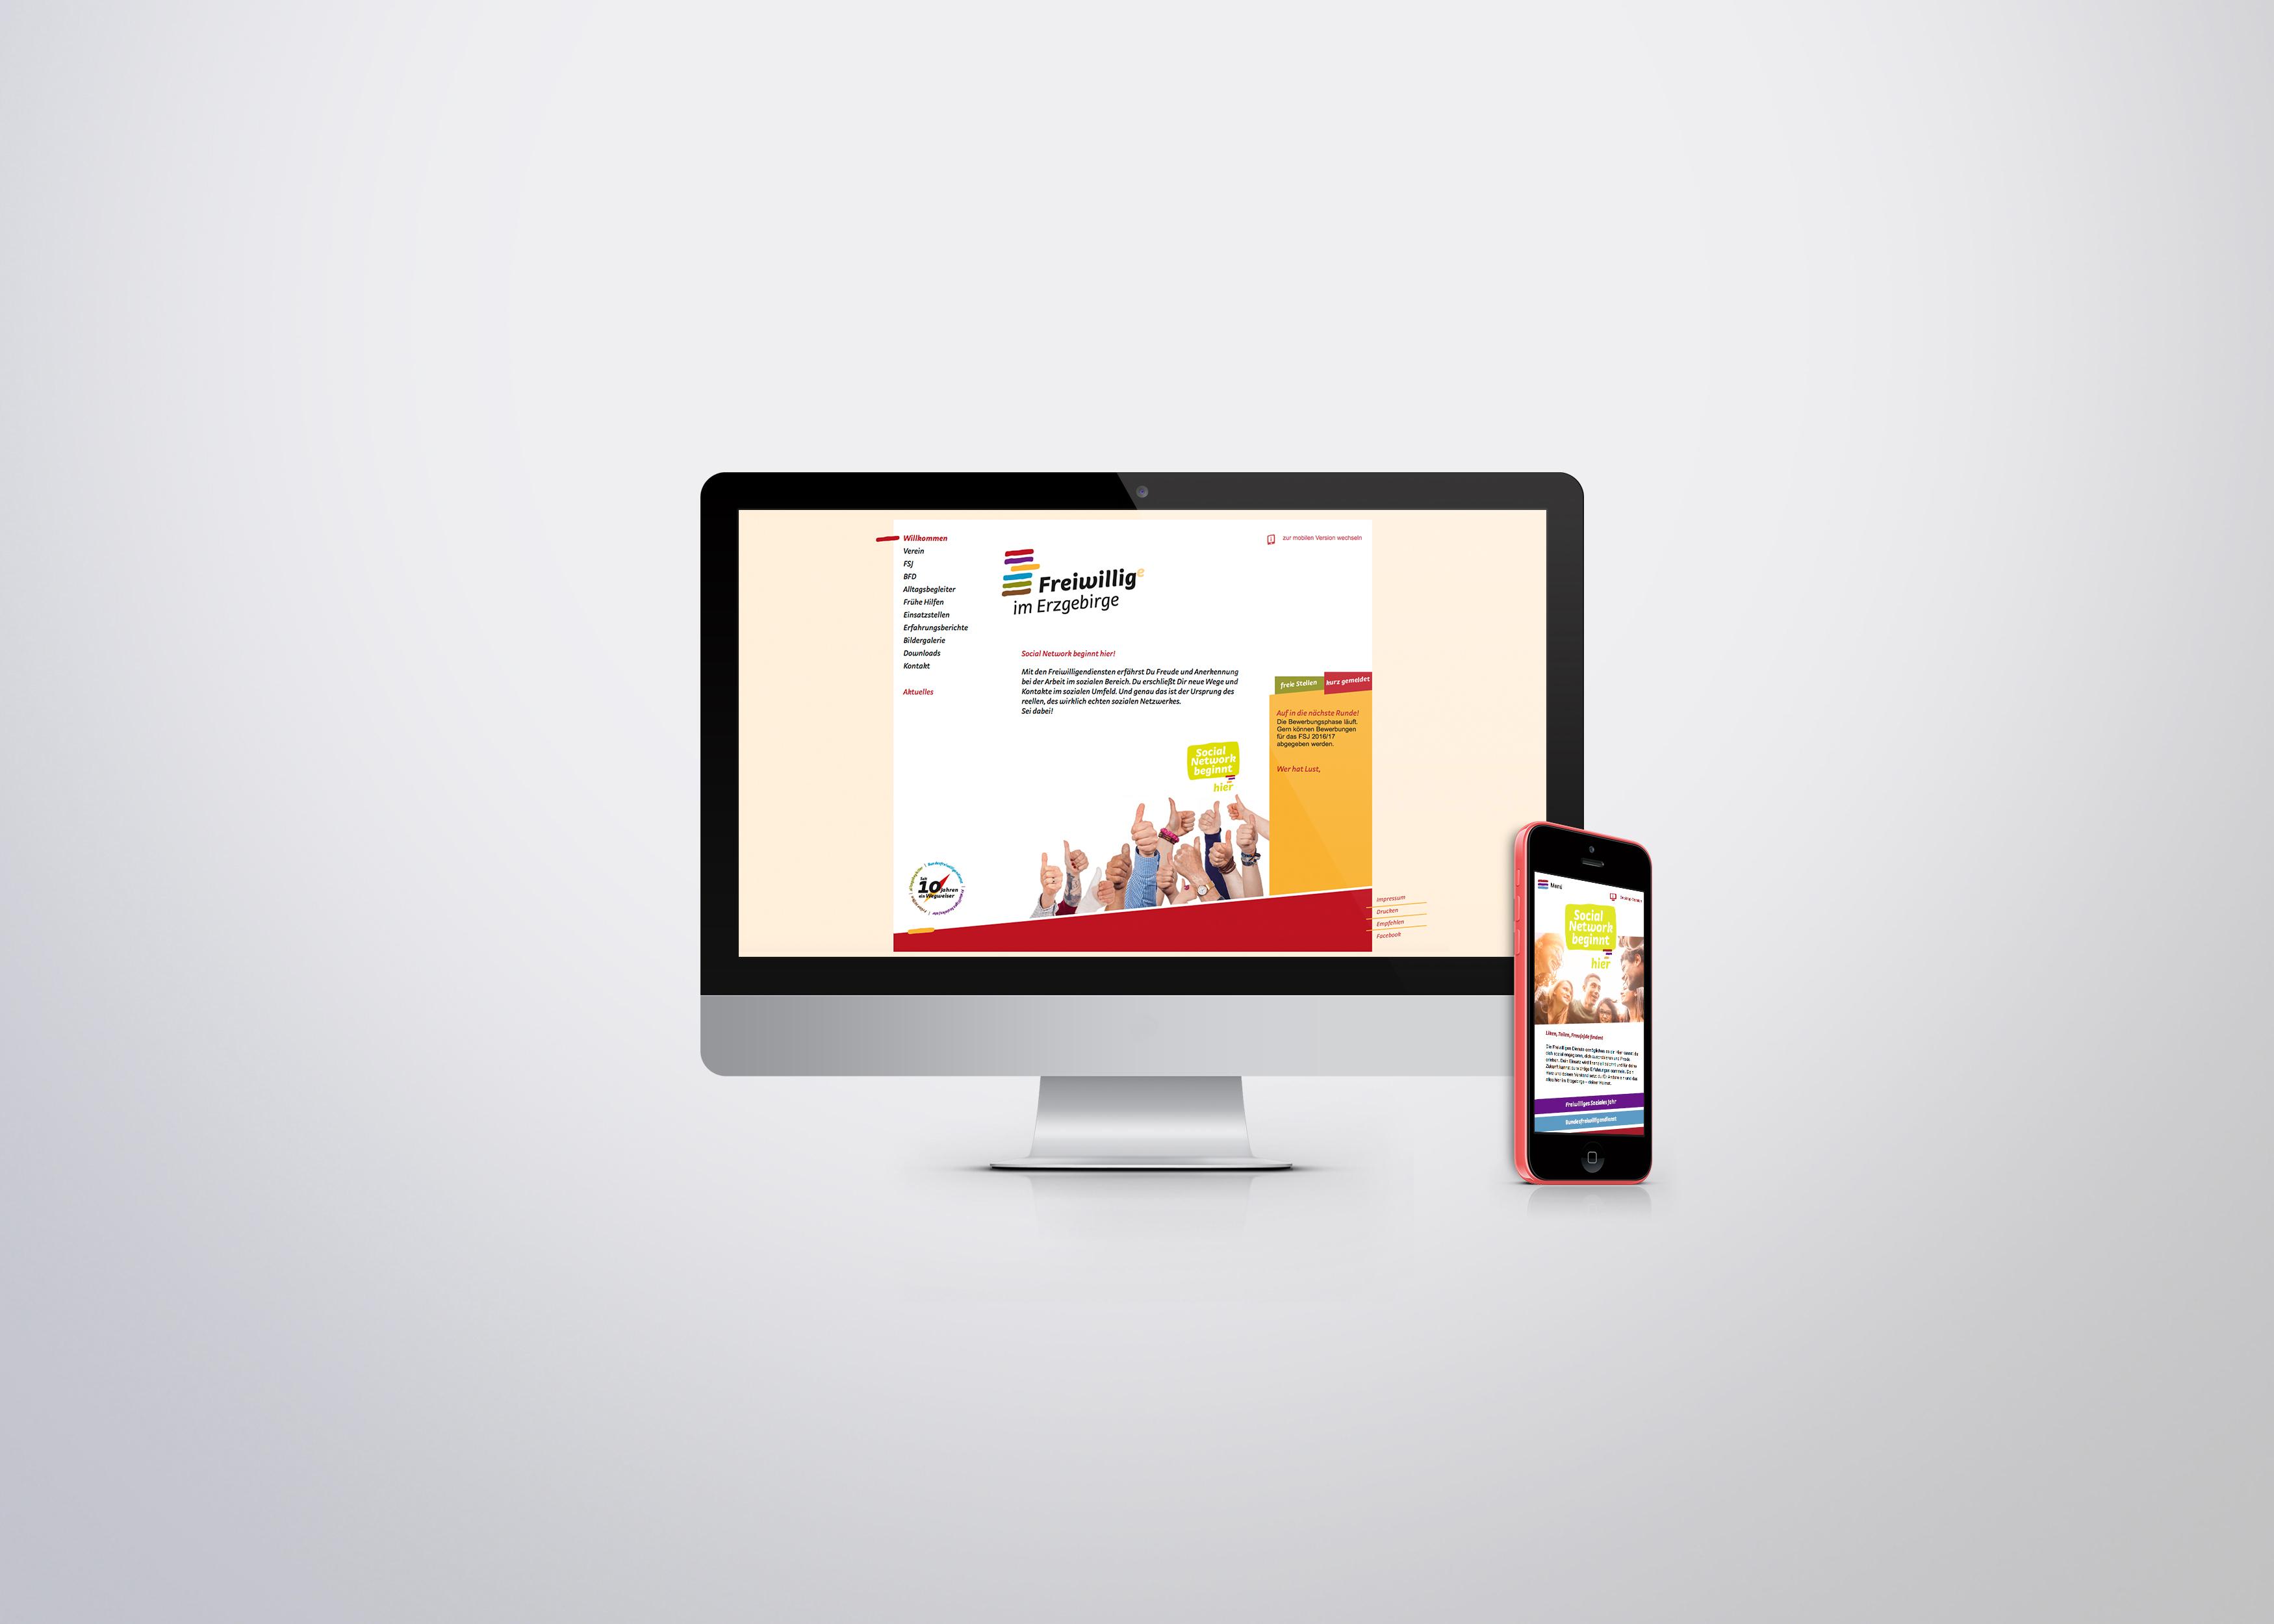 responsive_webdesign_freiwillige_im_erzgebirge